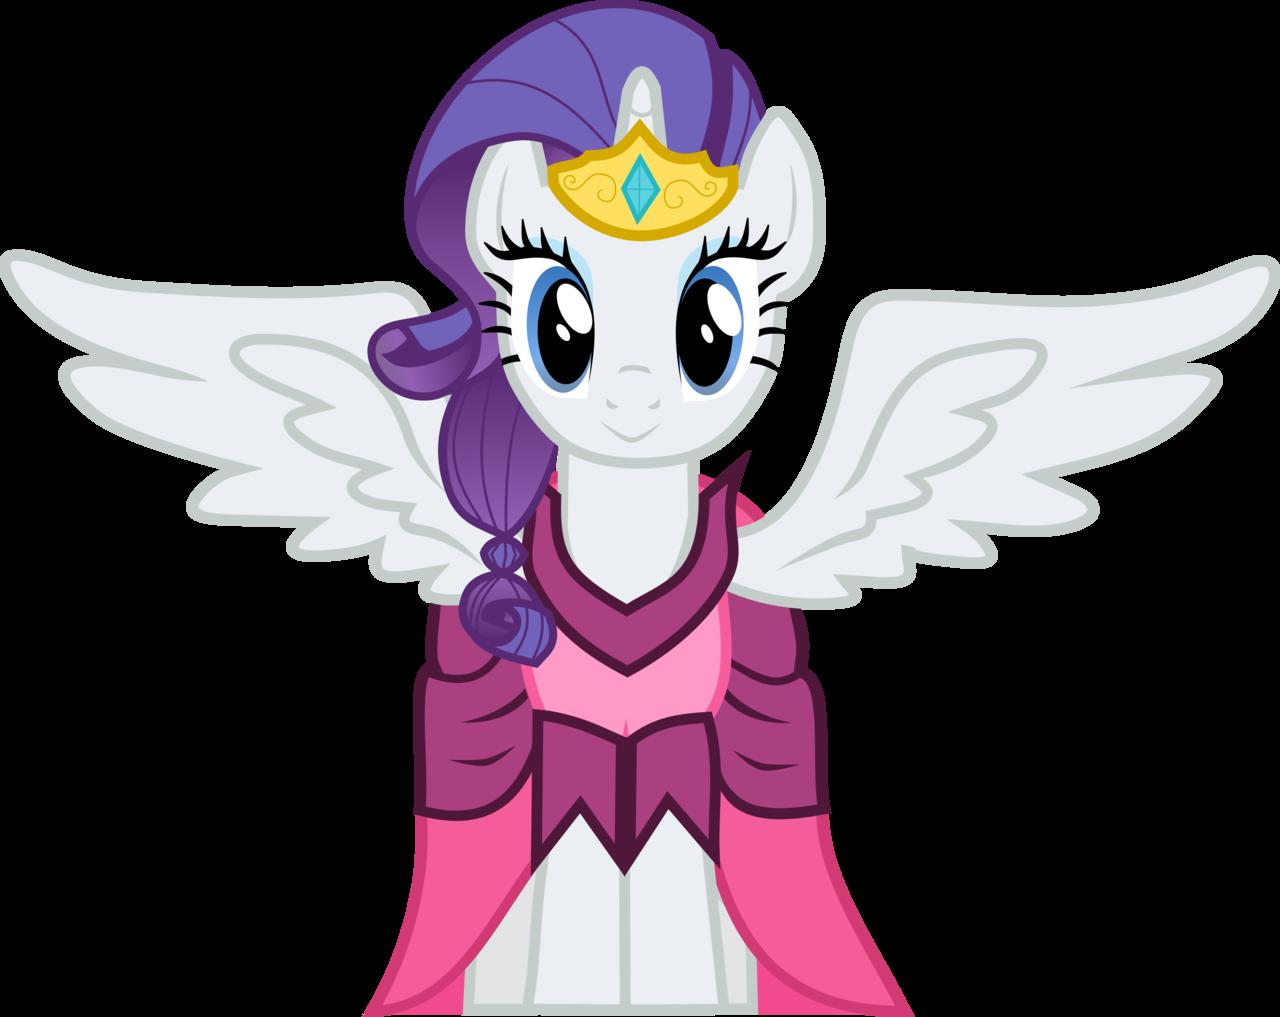 Картинка рарити принцесса